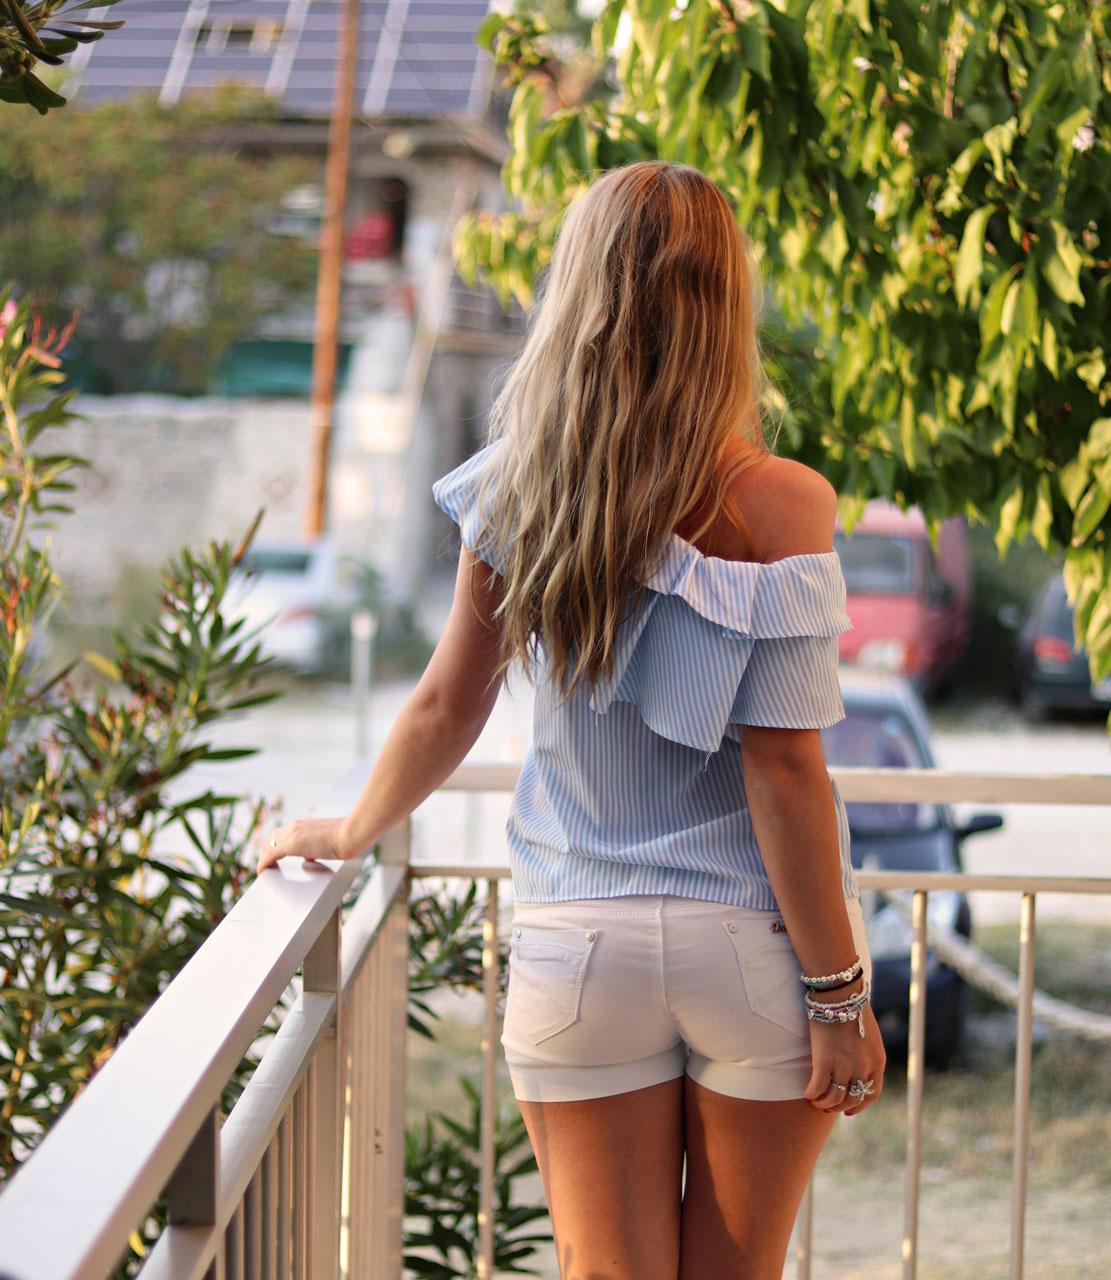 blondie.federova